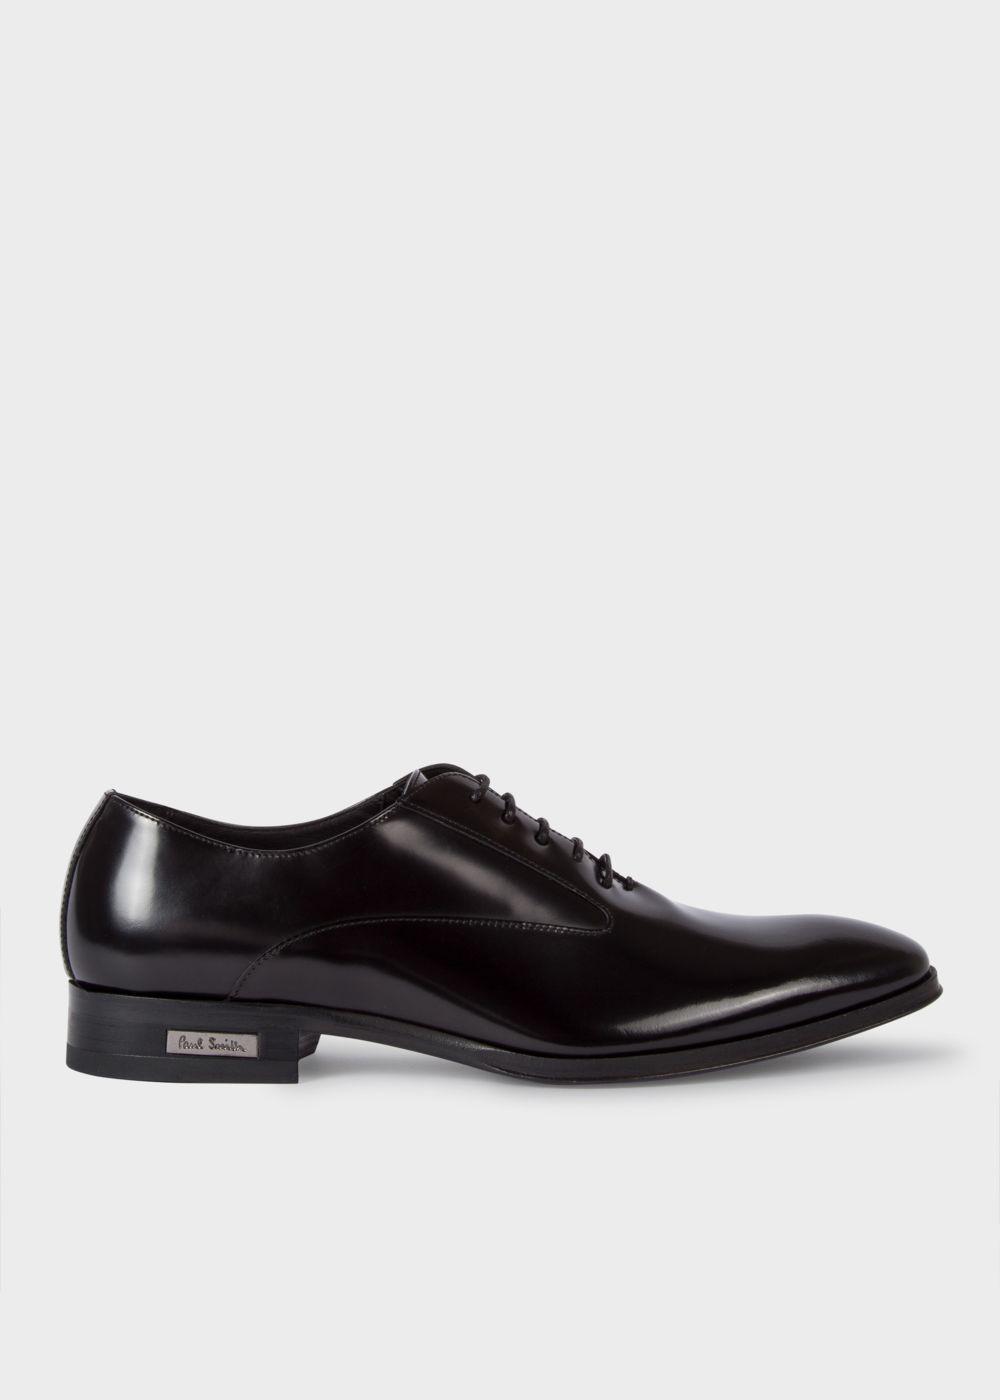 Blake Scott Mens Shoes